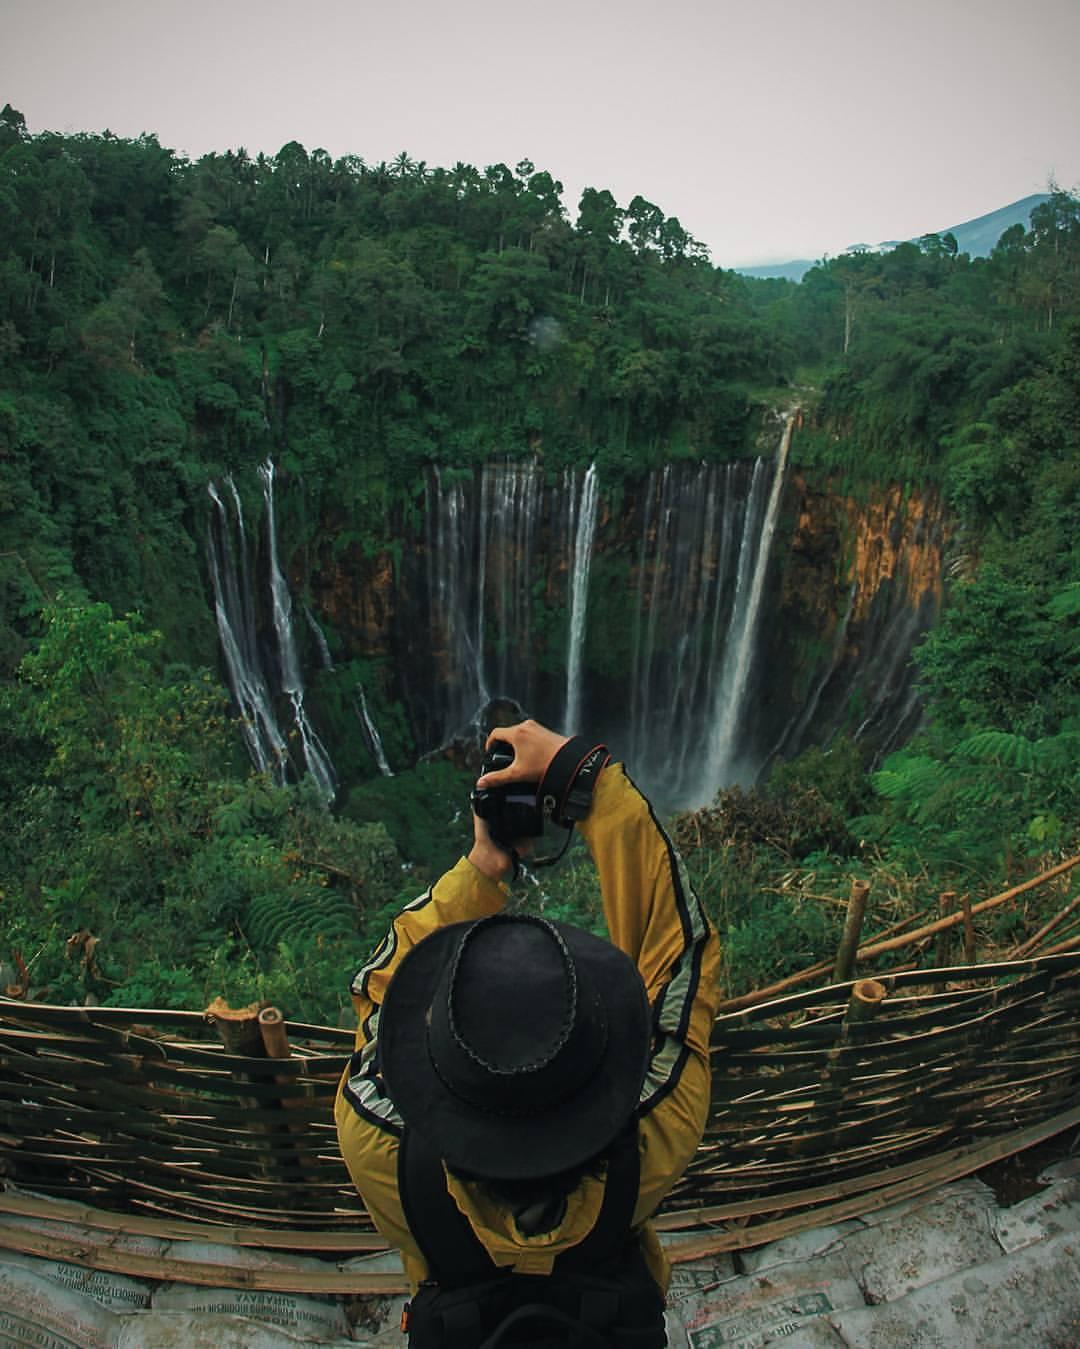 Surganya Landscape Photography, Surganya Landscape Photography Malang, Malang, Dolan Dolen, Dolaners Surganya Landscape Photography via hanifbagasu - Dolan Dolen